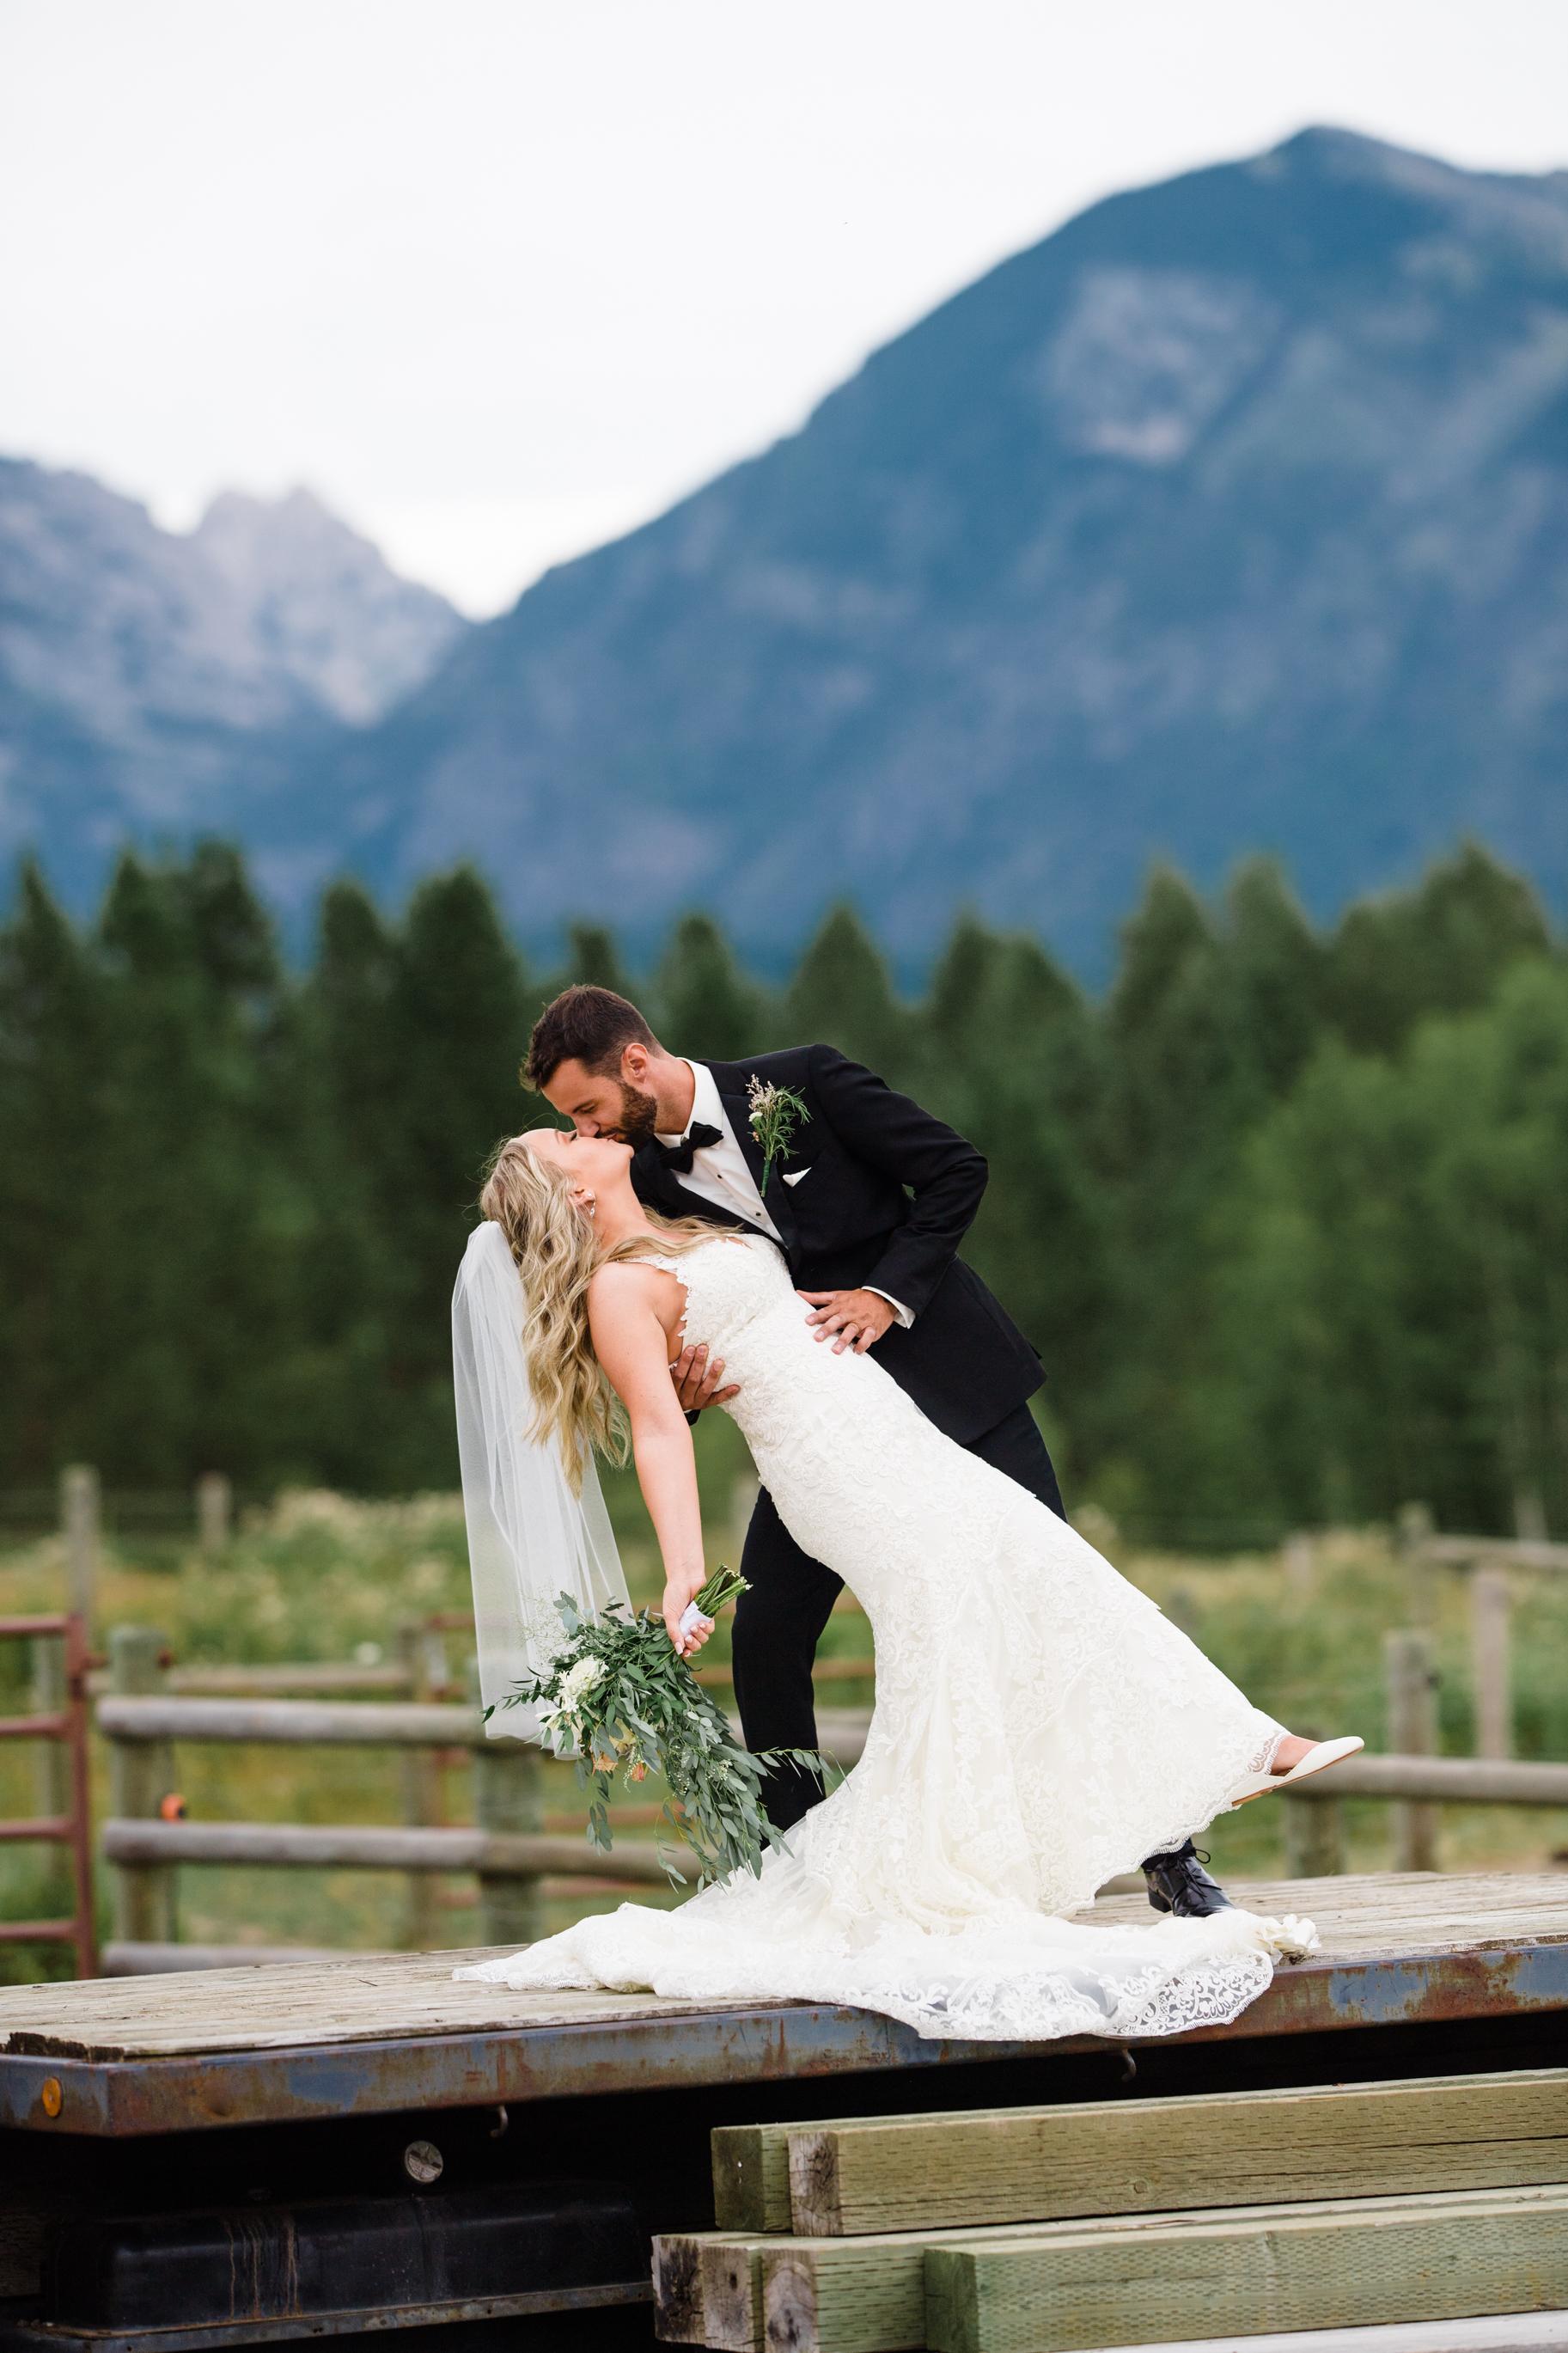 025Sky Ridge Ranch Wedding_Montana Wedding Photographer_Jessica & Brian_Honeybee Weddings_August 24, 2019-16.jpg